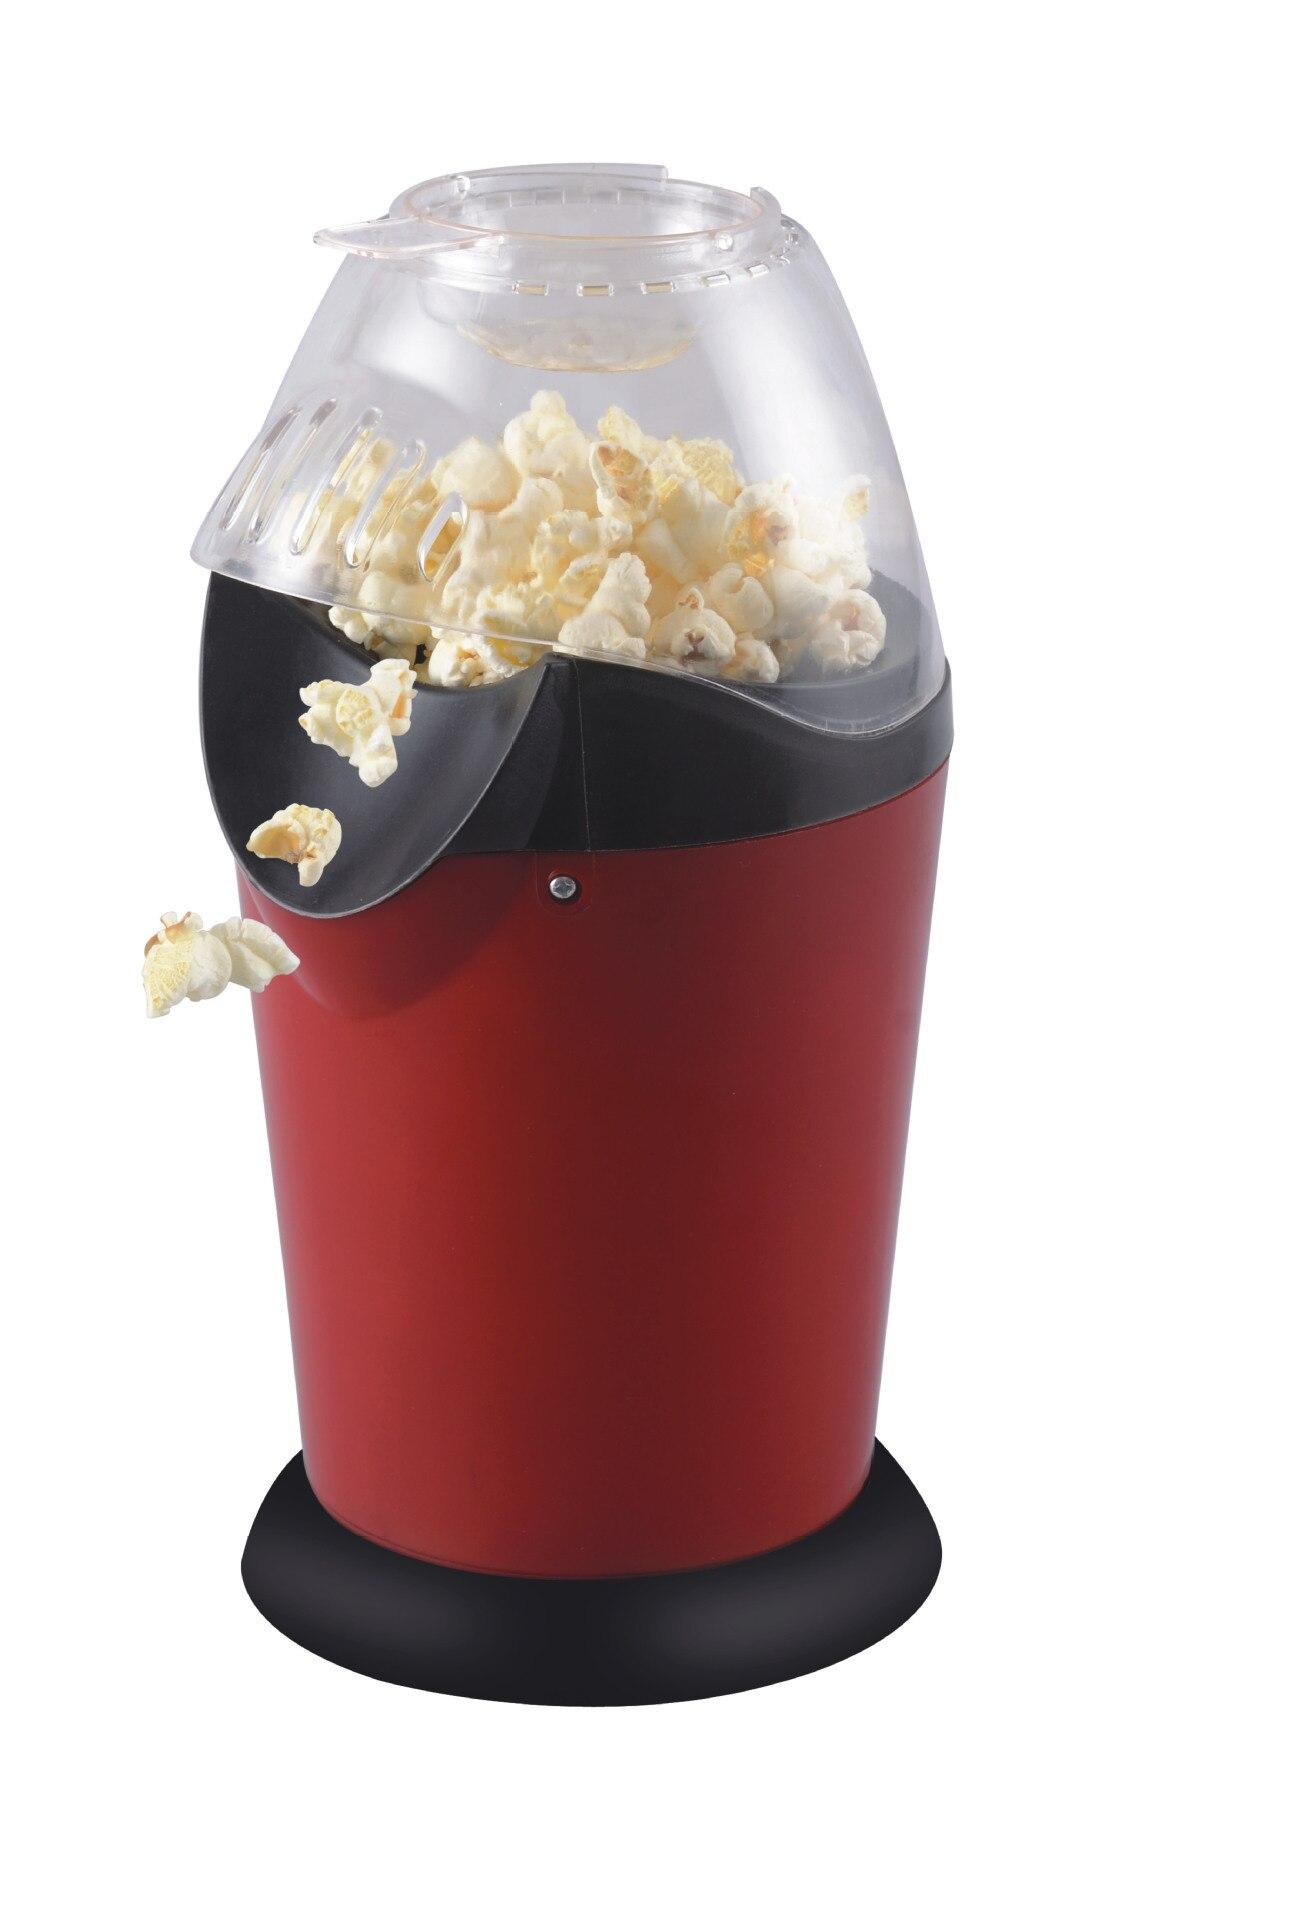 Household Portable Electric Popcorn Maker Hot Air Popcorn Making Machine for Kitchen Desktop Mini DIY Corn Maker 110V 220V 220v automatic mini portable electric popcorn maker machine hot air electric diy sweet popcorn machine eu au uk plug